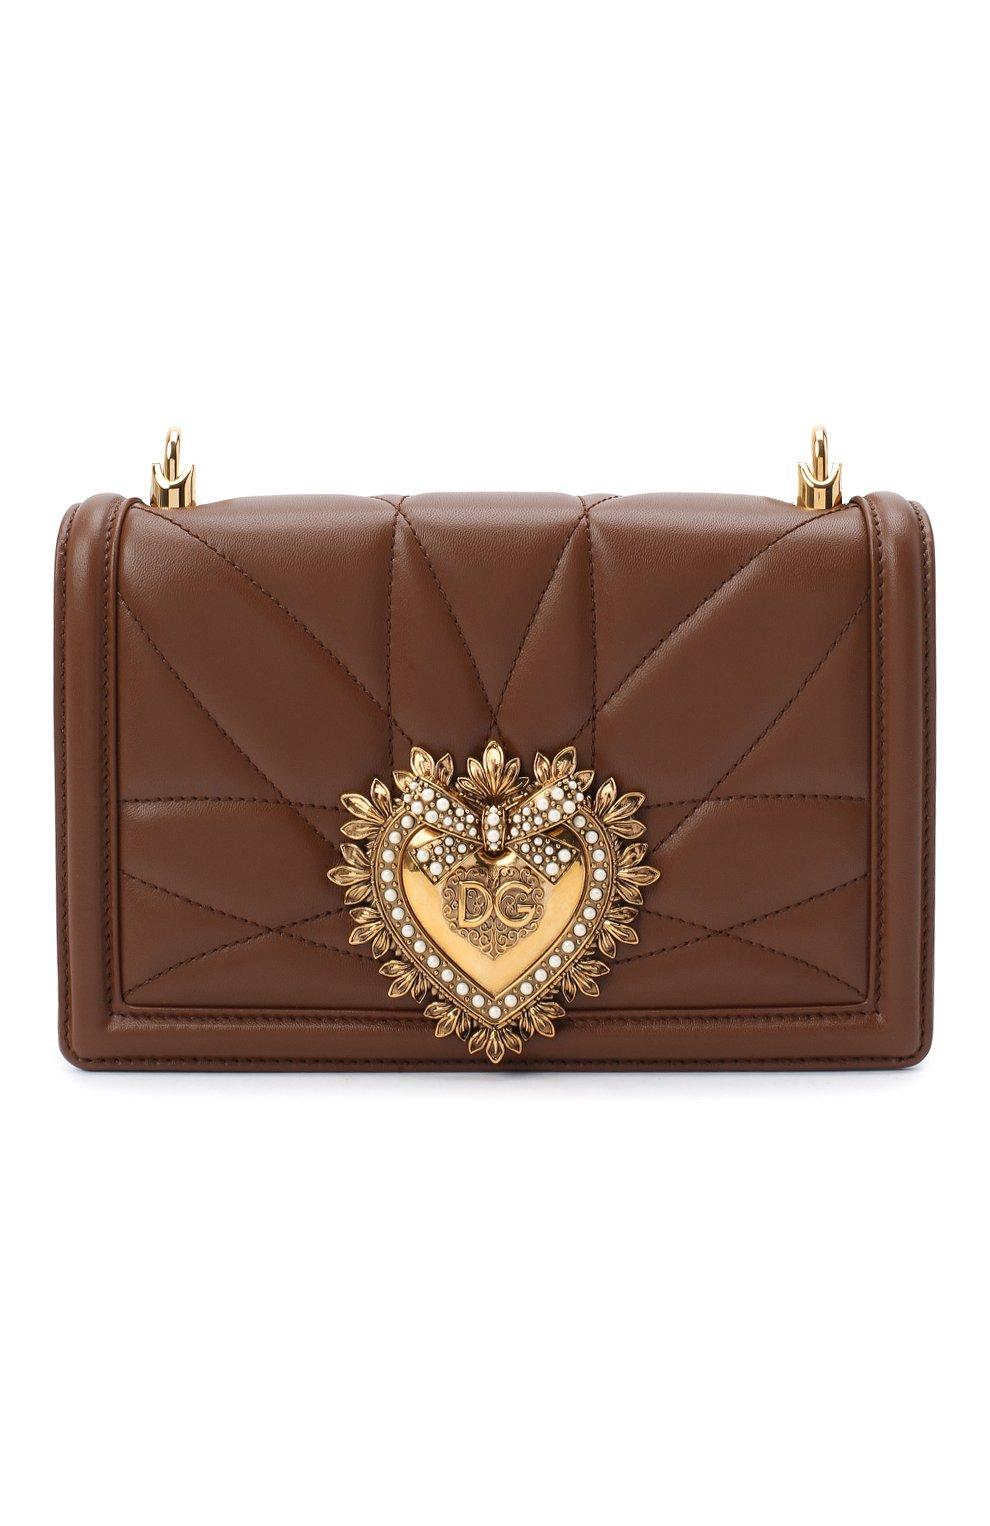 сумка dolce gabbana devotion купить